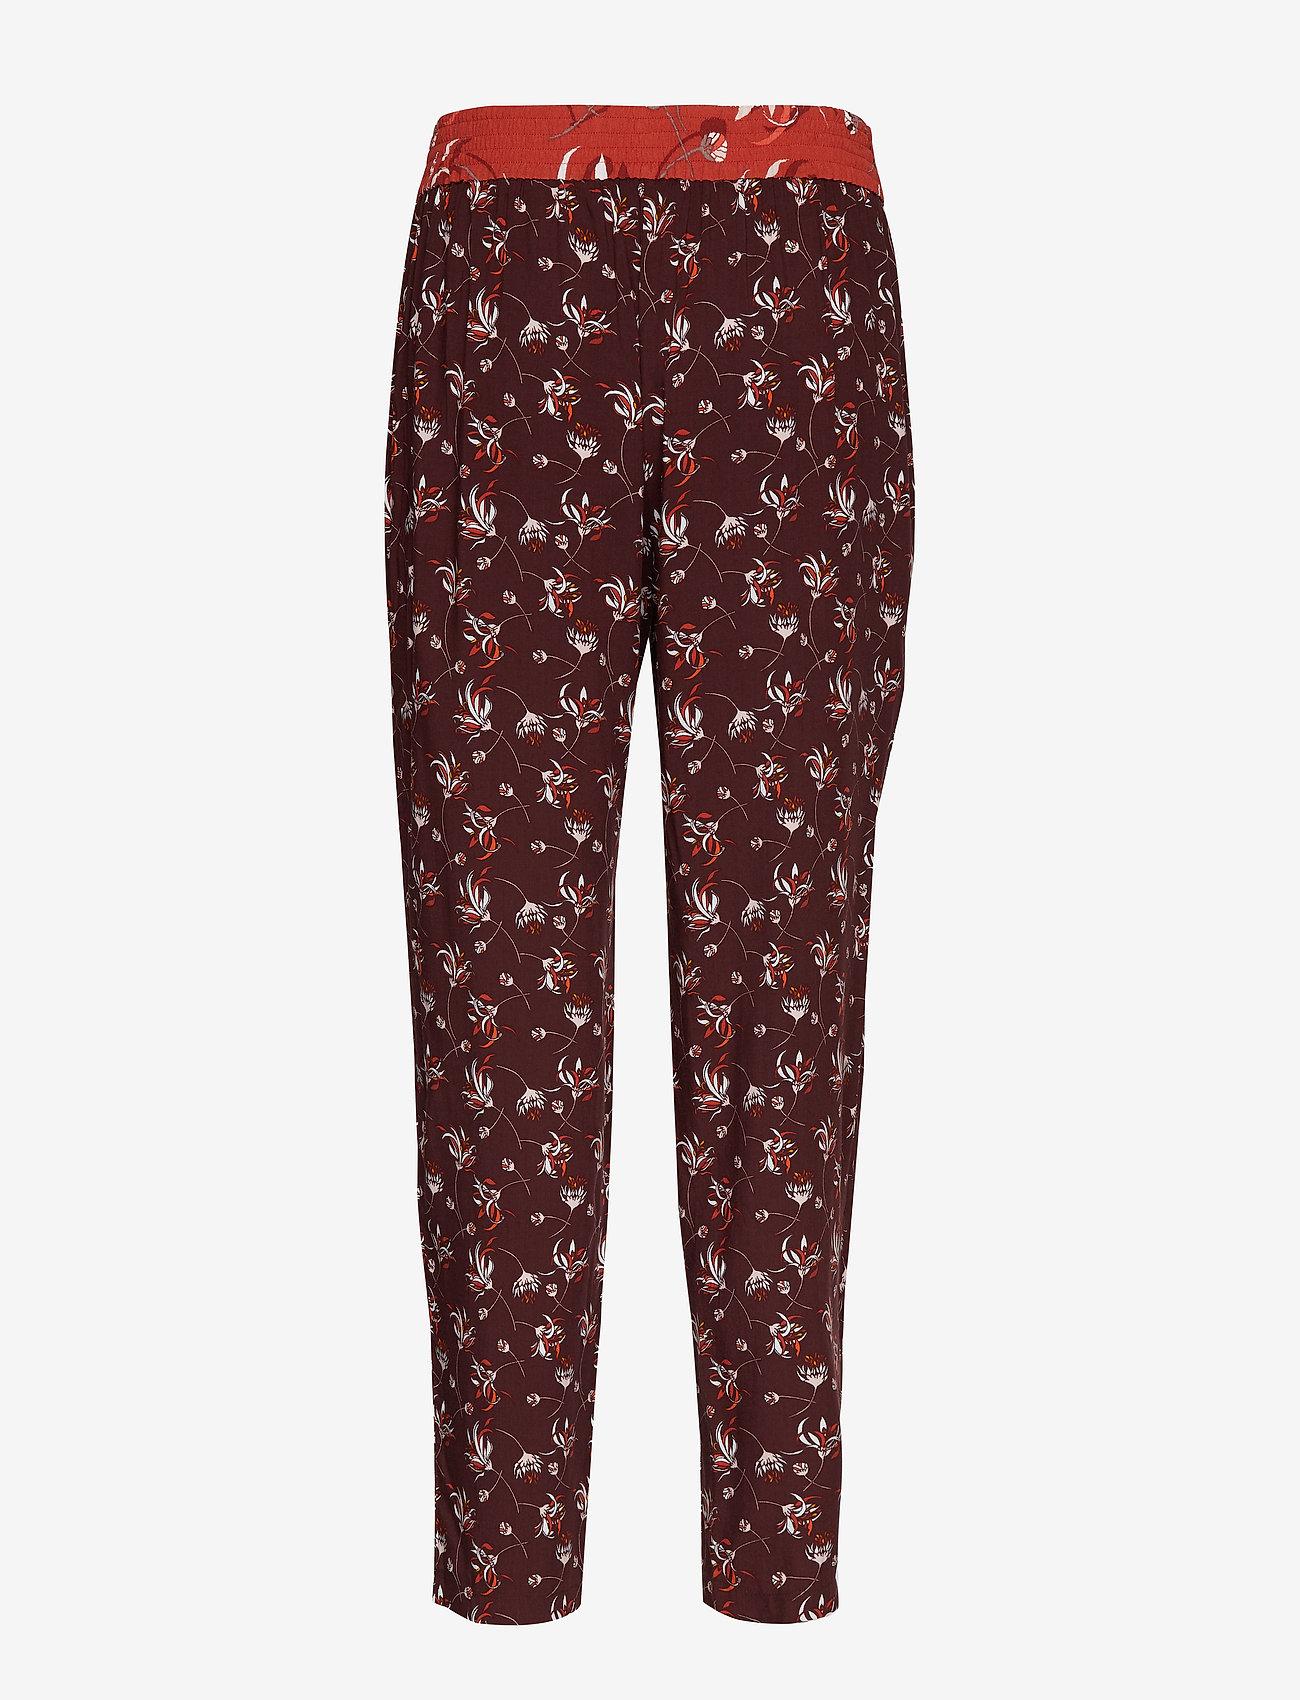 Taifun - CROP LEISURE TROUSER - straight leg trousers - deep burgundy patterned